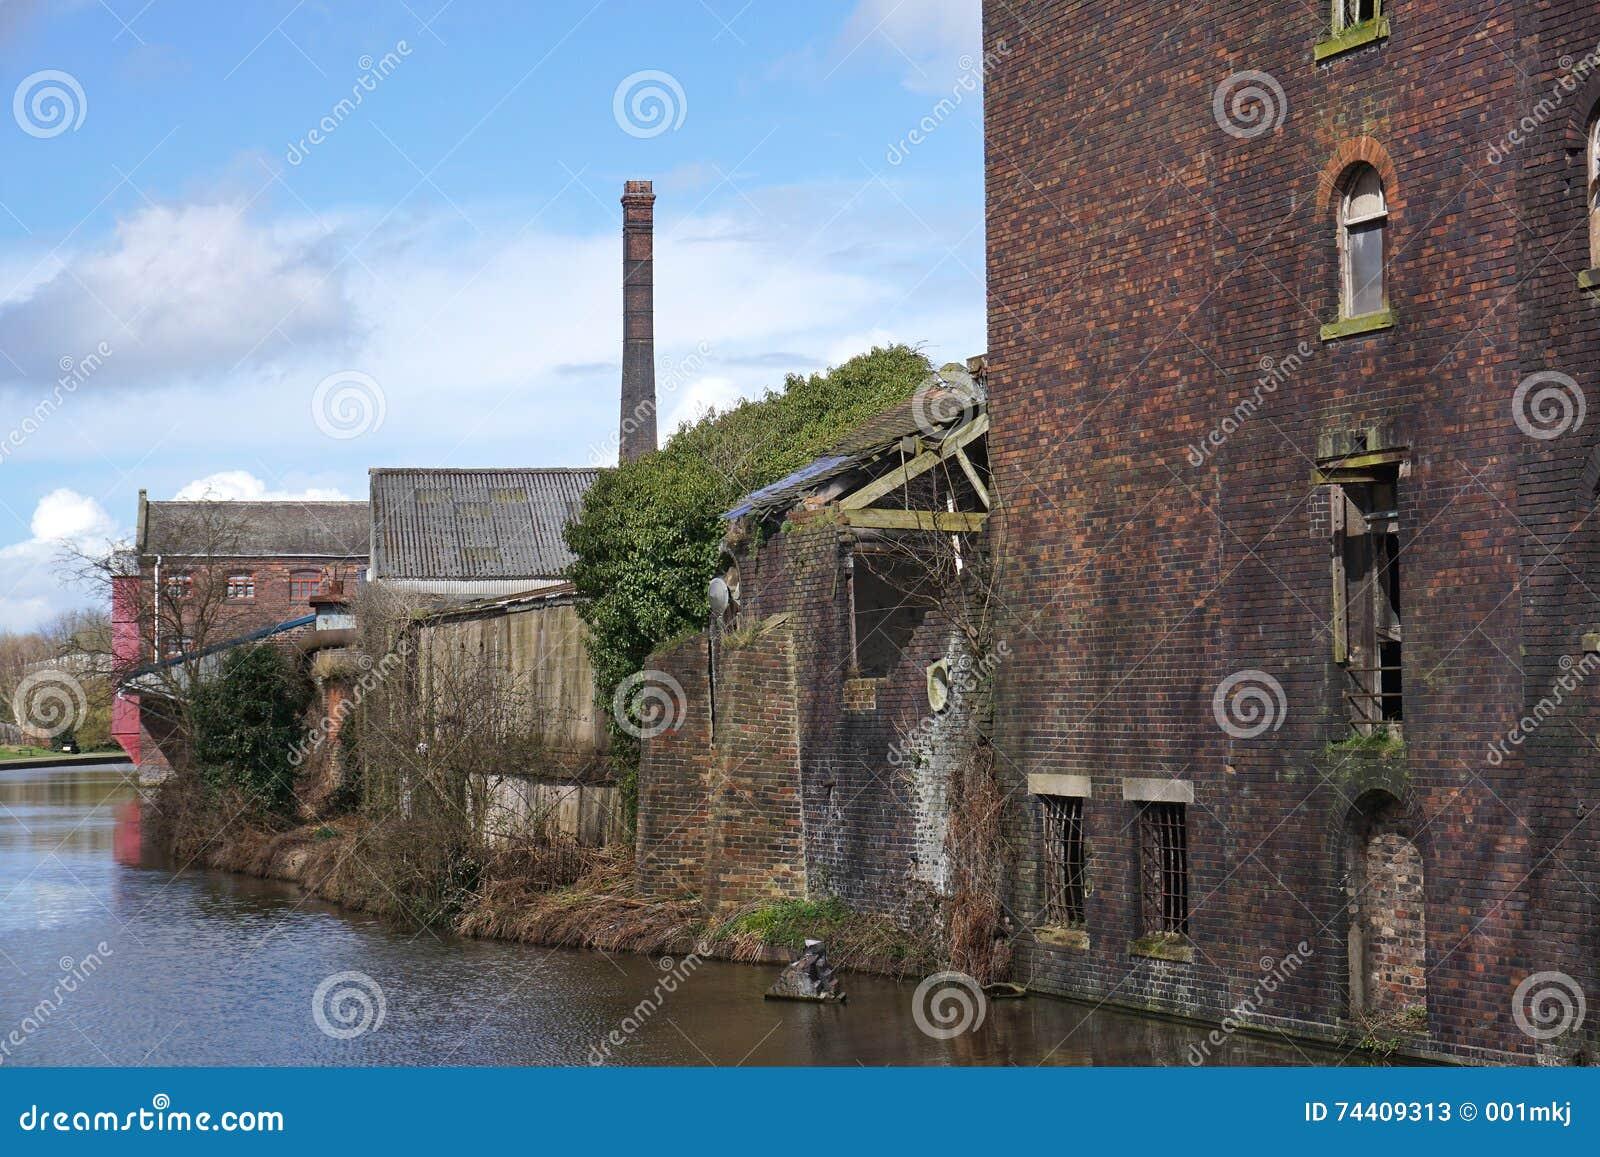 Rundown Building Decay Stock Photos Rundown: Run Down Industrial Buildings Alongside A Canal Stock